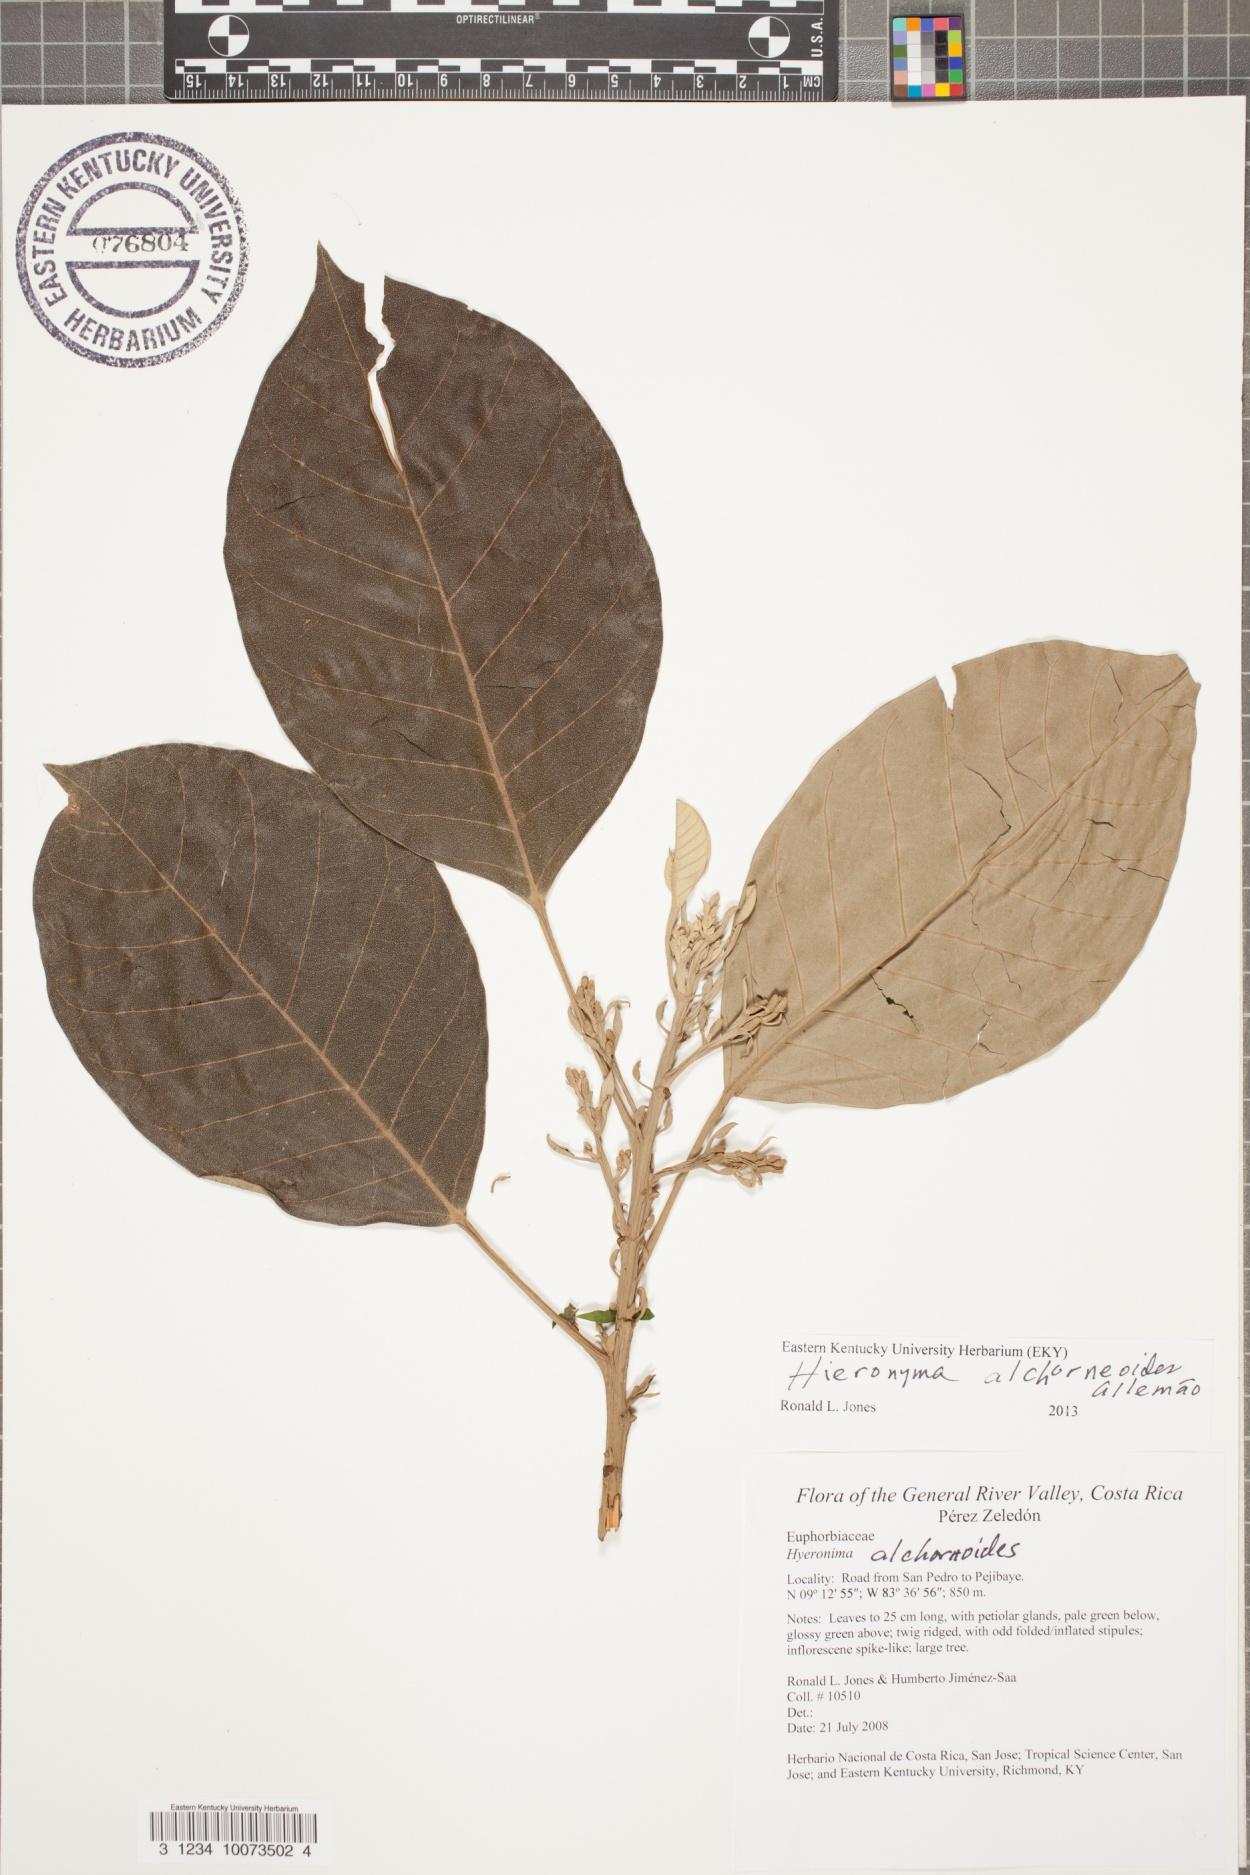 Hieronyma alchorneoides image